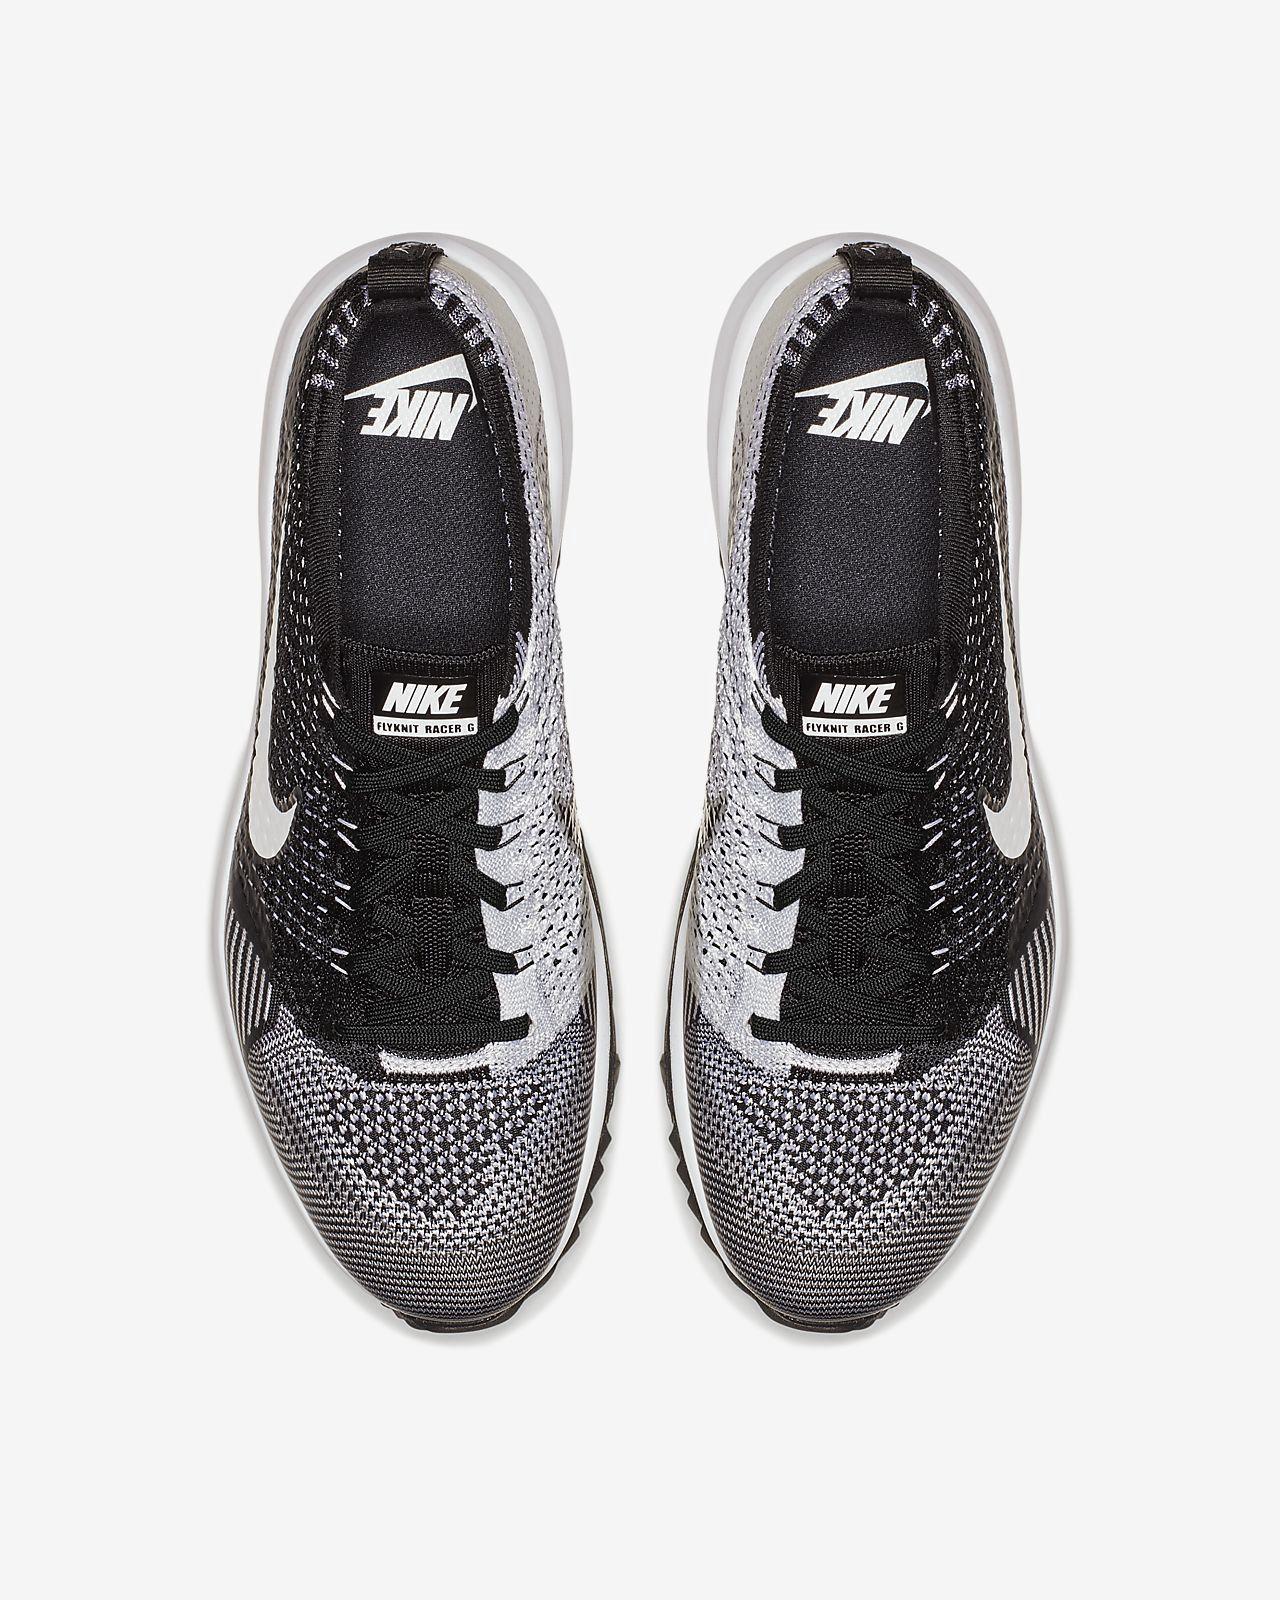 4f26d246fed5 Nike Flyknit Racer G Men s Golf Shoe - 11.5